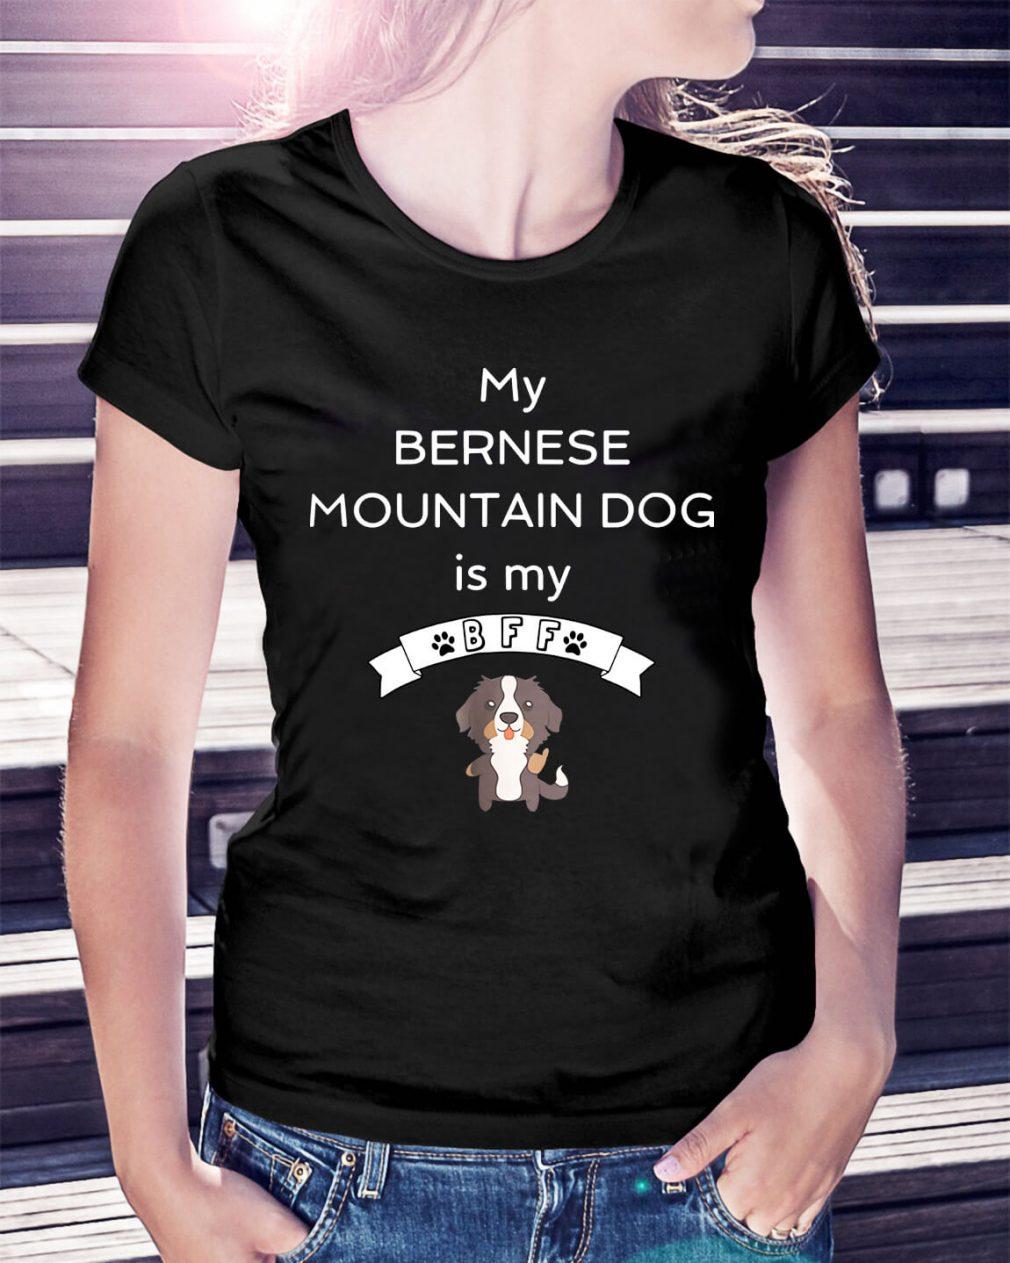 My Bernese mountain dog is my Bff Ladies Tee